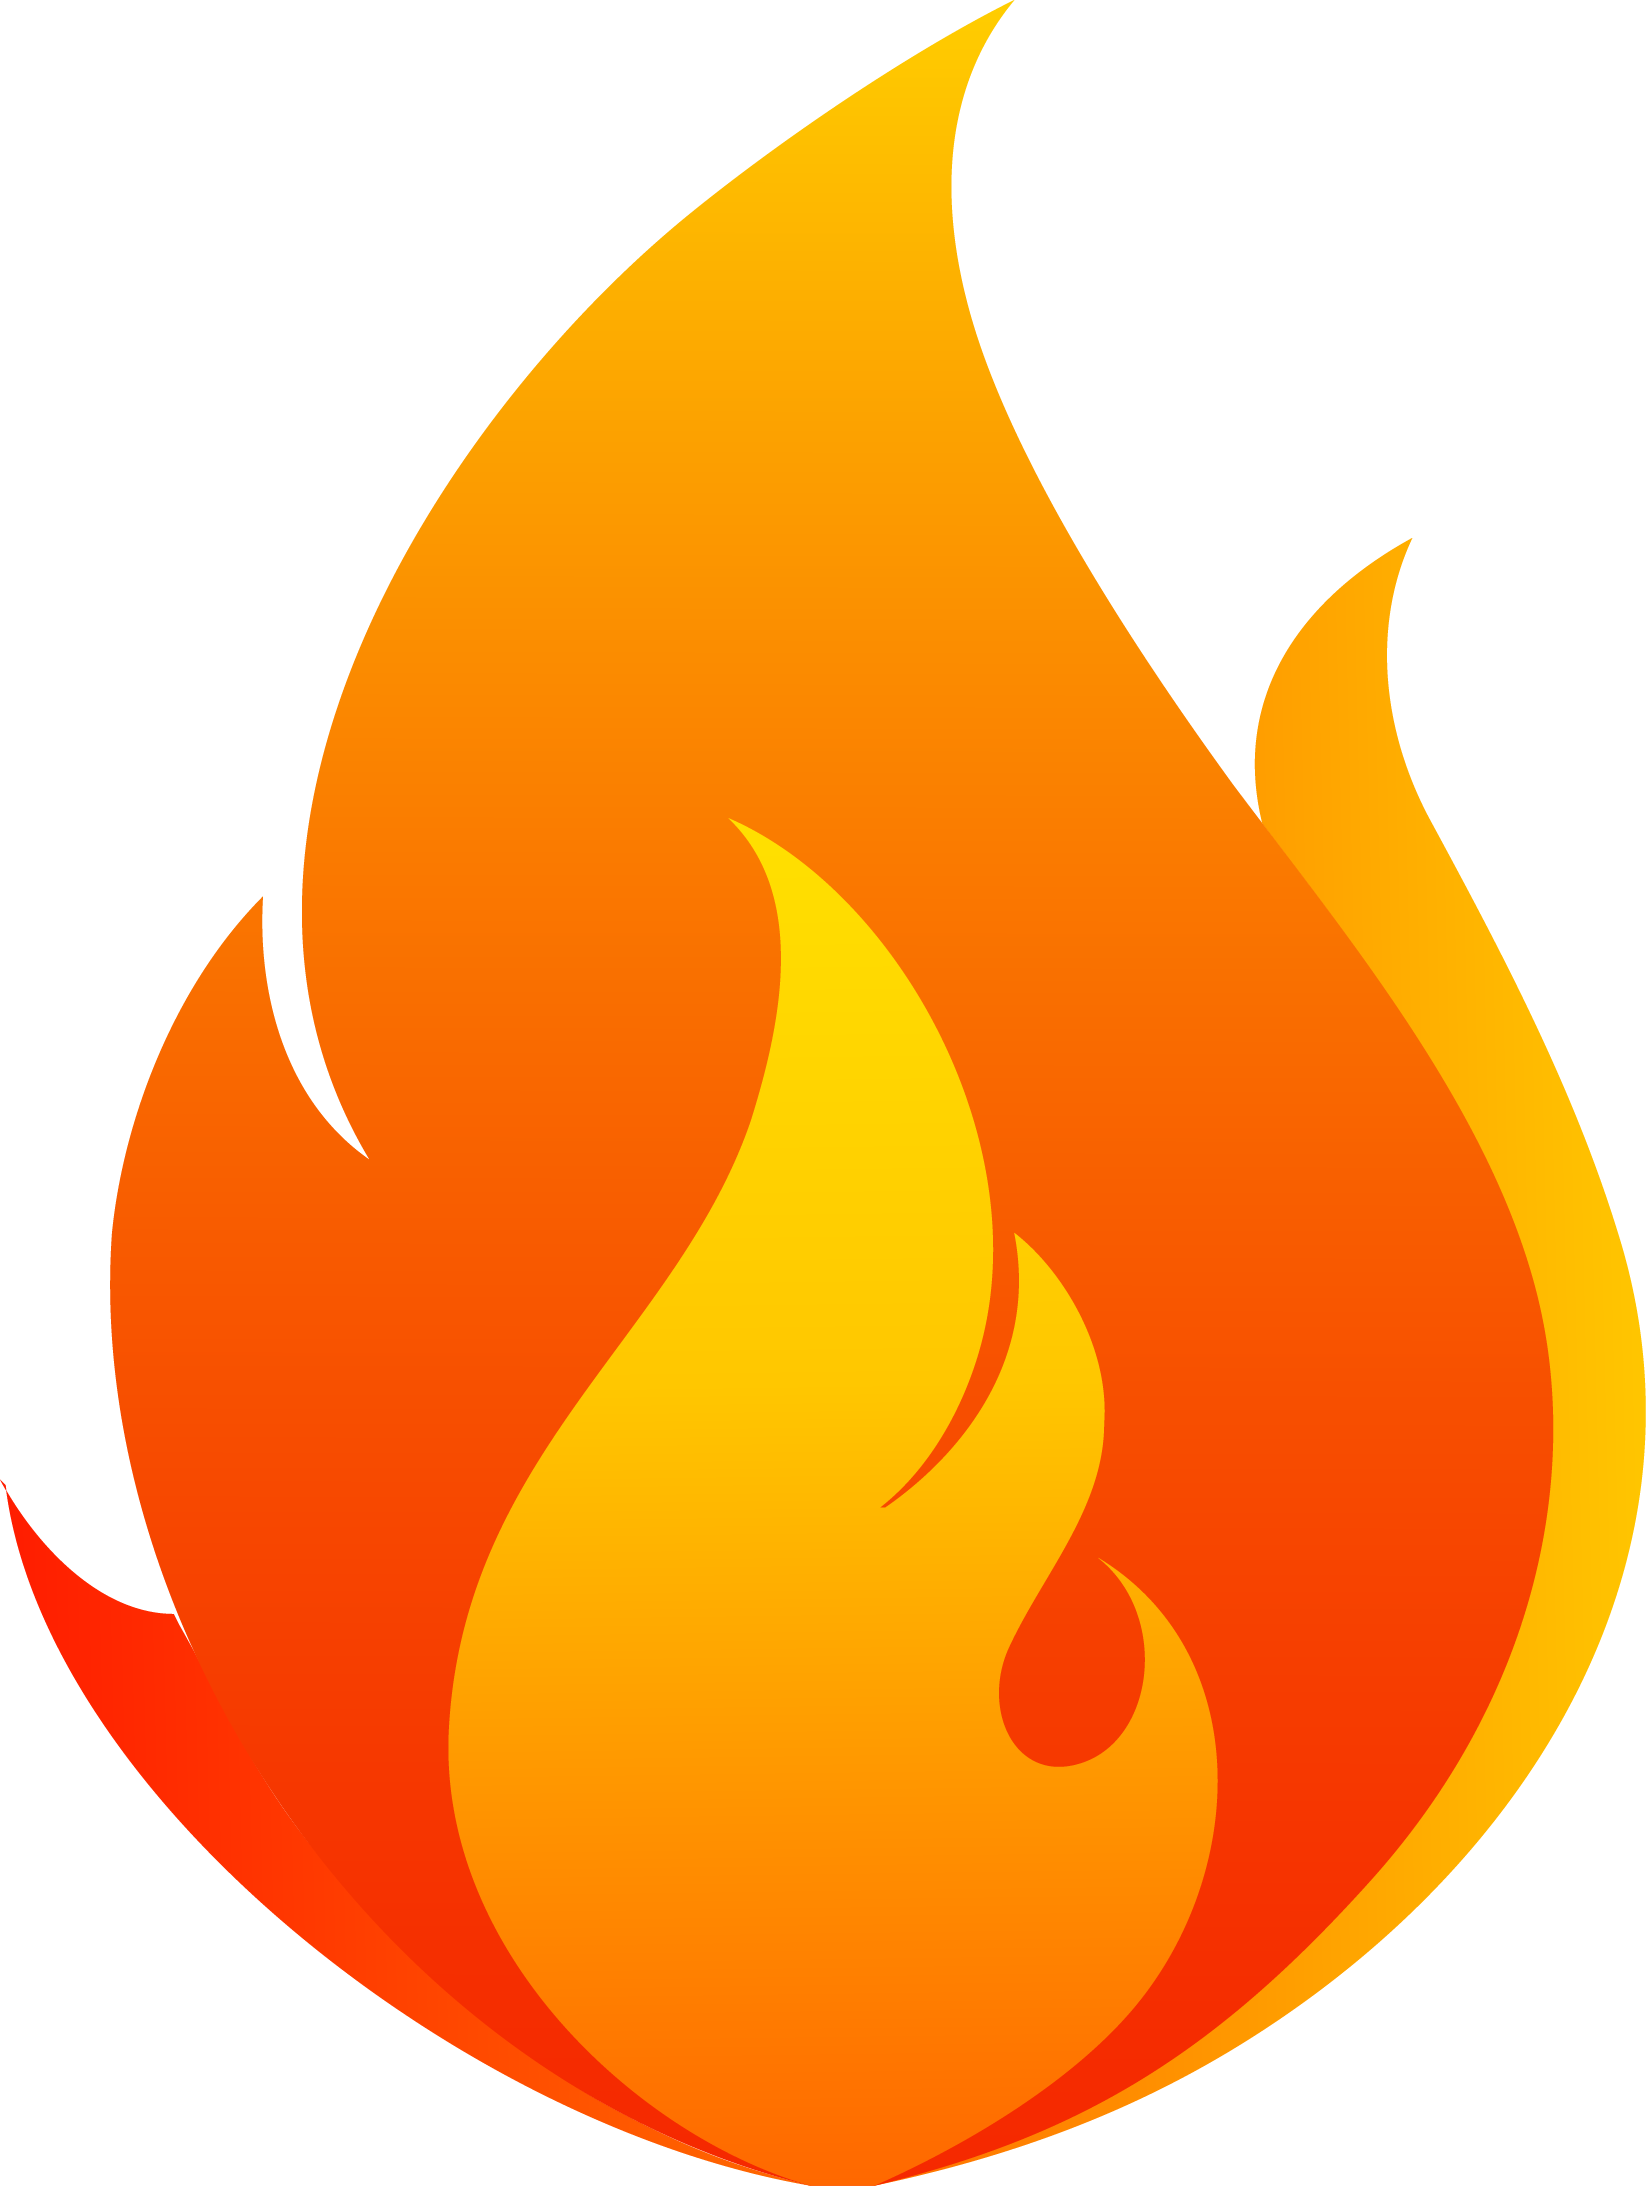 Clipart flames red flame, Clipart flames red flame ...